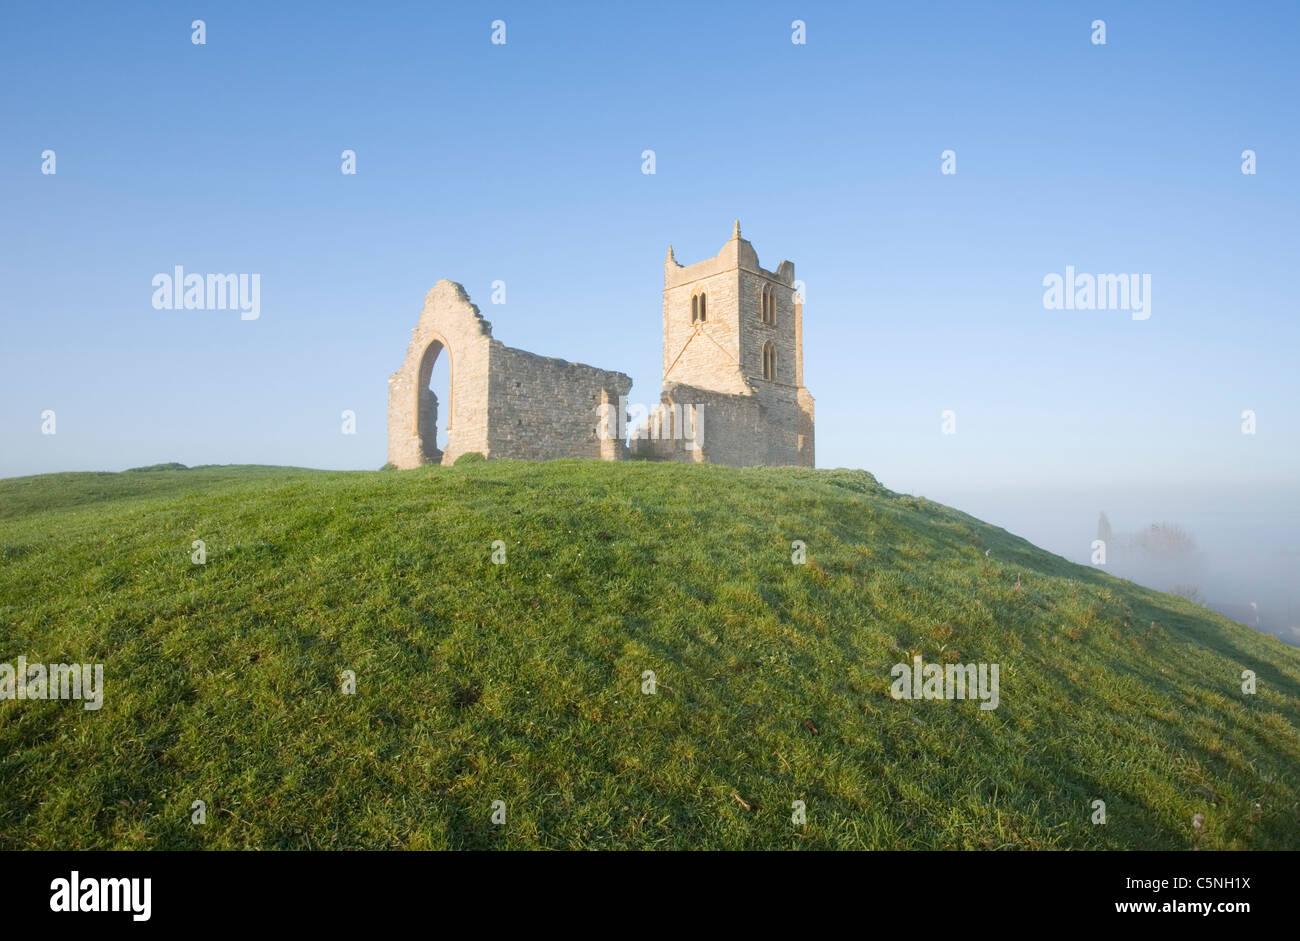 Ruin of St Michael's Church on Burrow Mump. Somerset. England. UK. - Stock Image